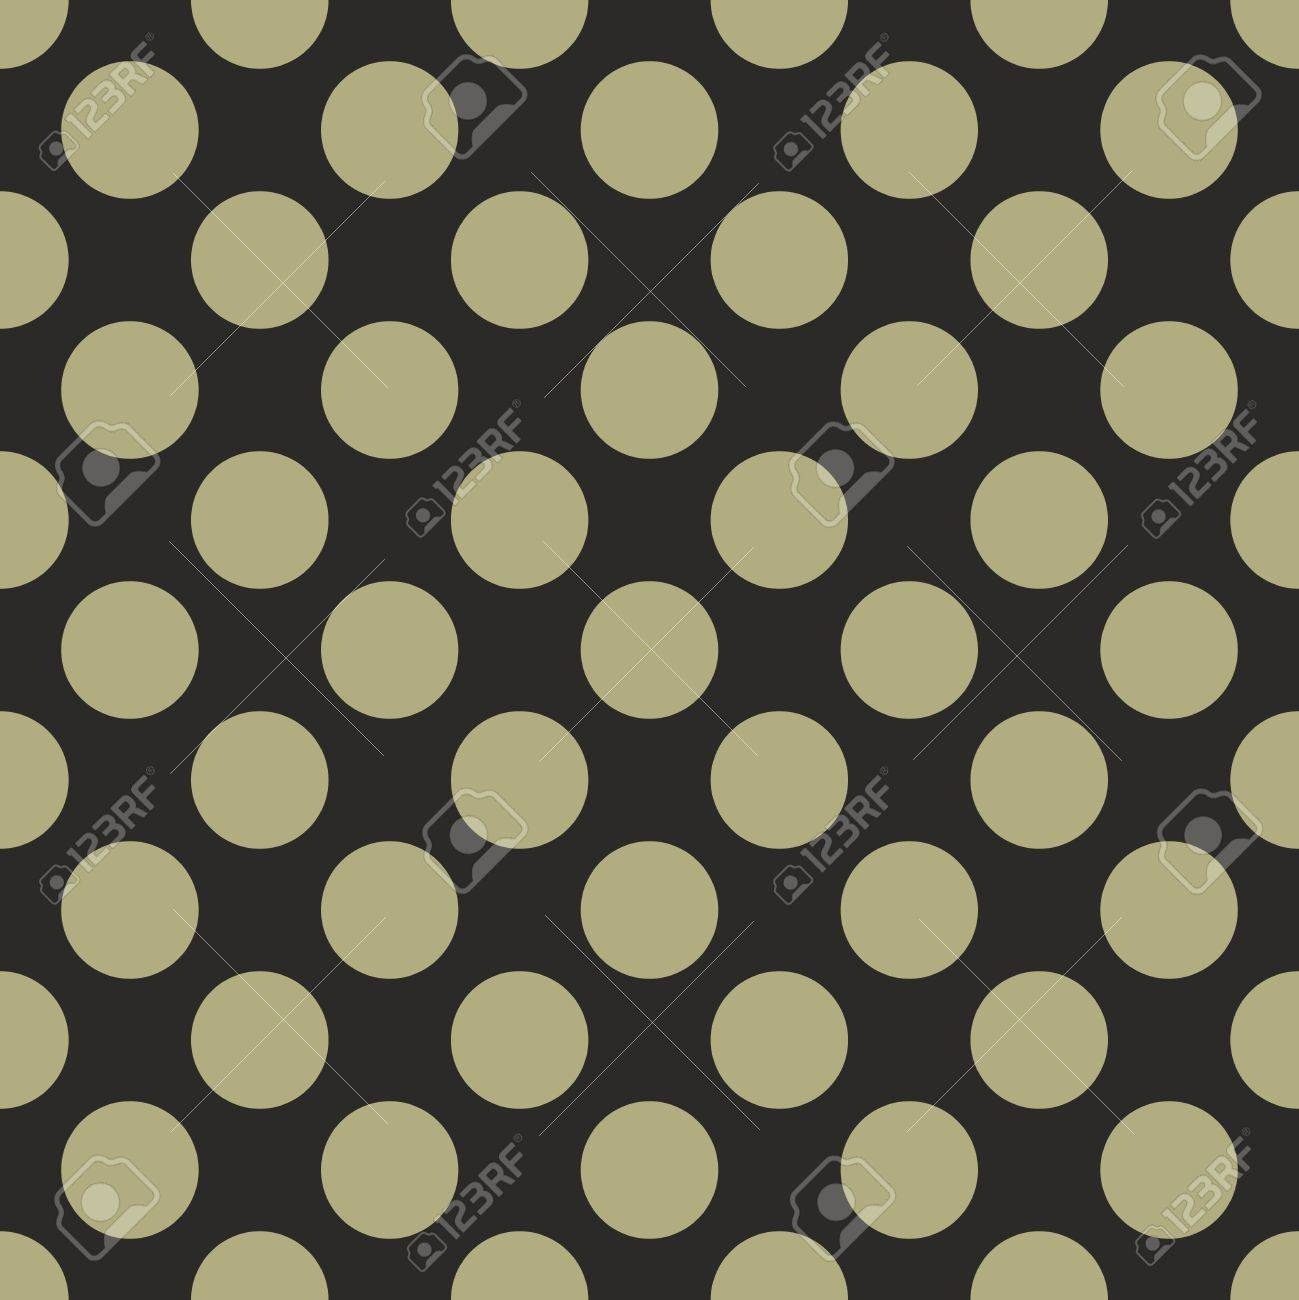 Download Wallpaper Halloween Polka Dot - 30974270-black-vector-tile-background-with-green-polka-dots-seamless-pattern-for-halloween-desktop-wallpaper-  Pictures_95736.jpg